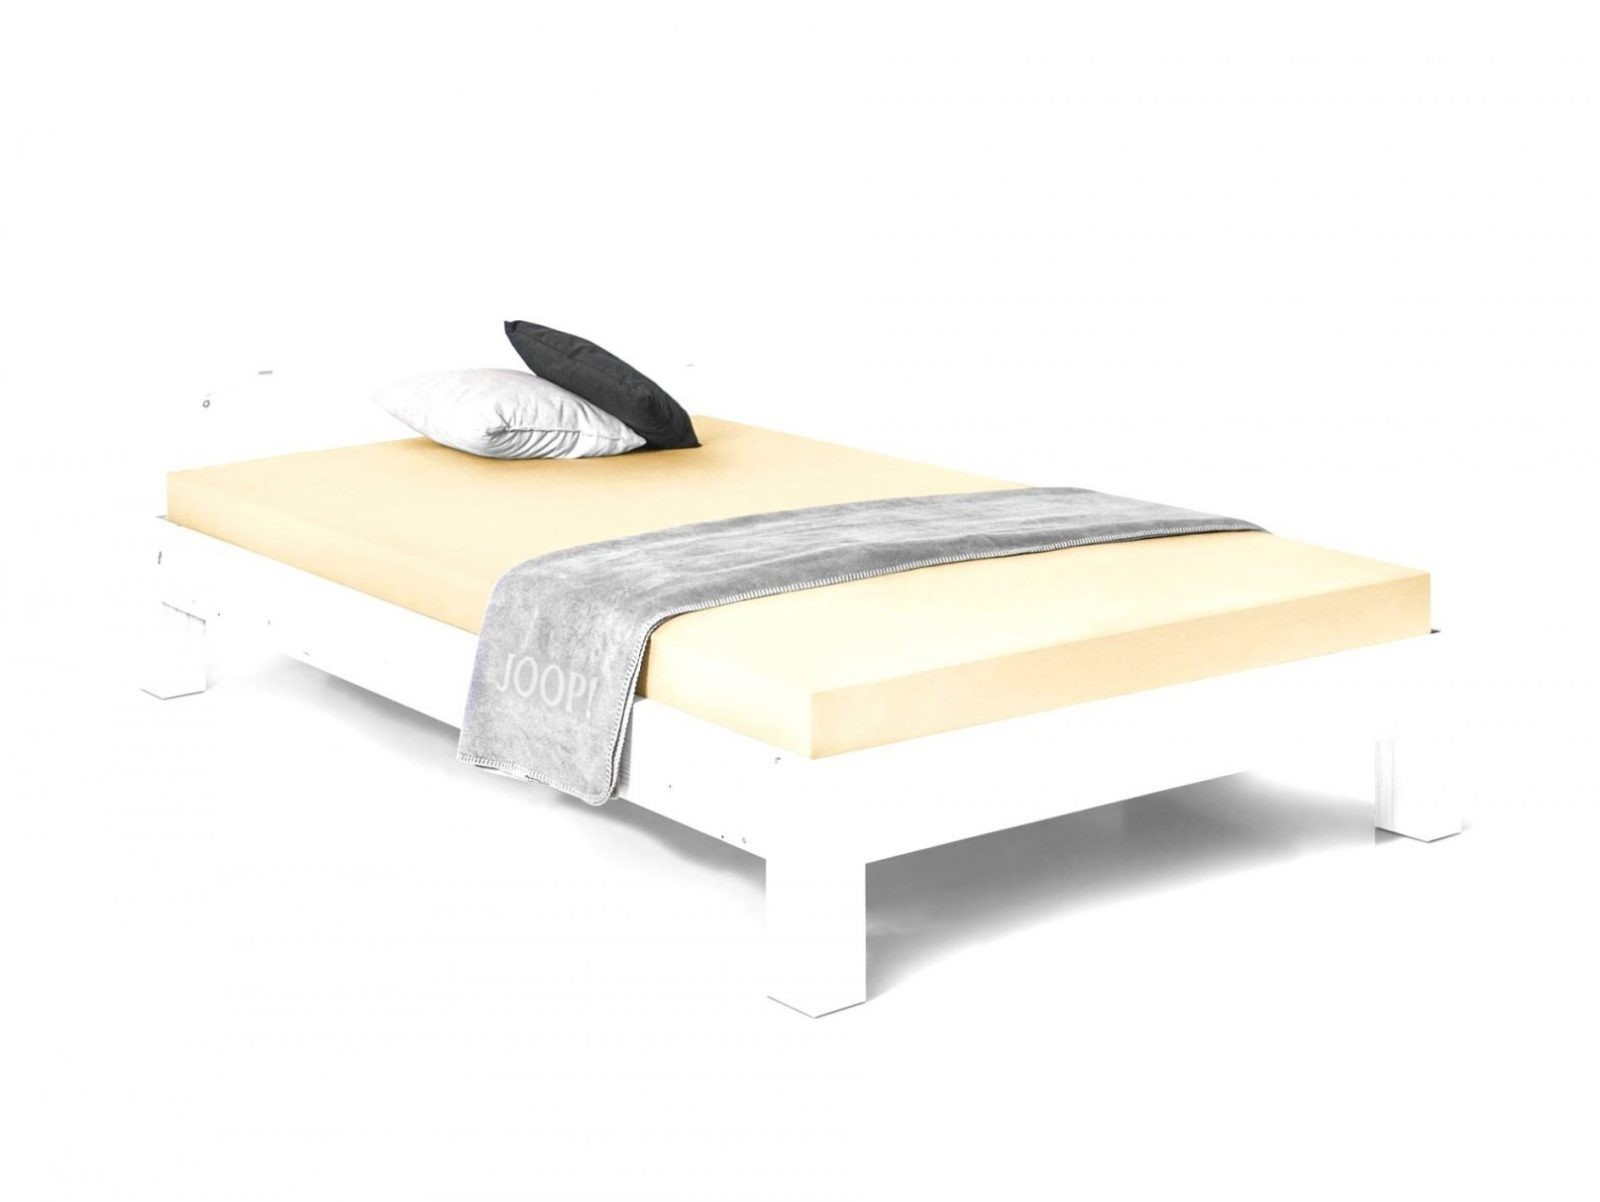 Bett 140×200 Mit Lattenrost Und Matratze Elegant Bett Mit Matratze von Lattenrost Und Matratze 120X200 Set Bild